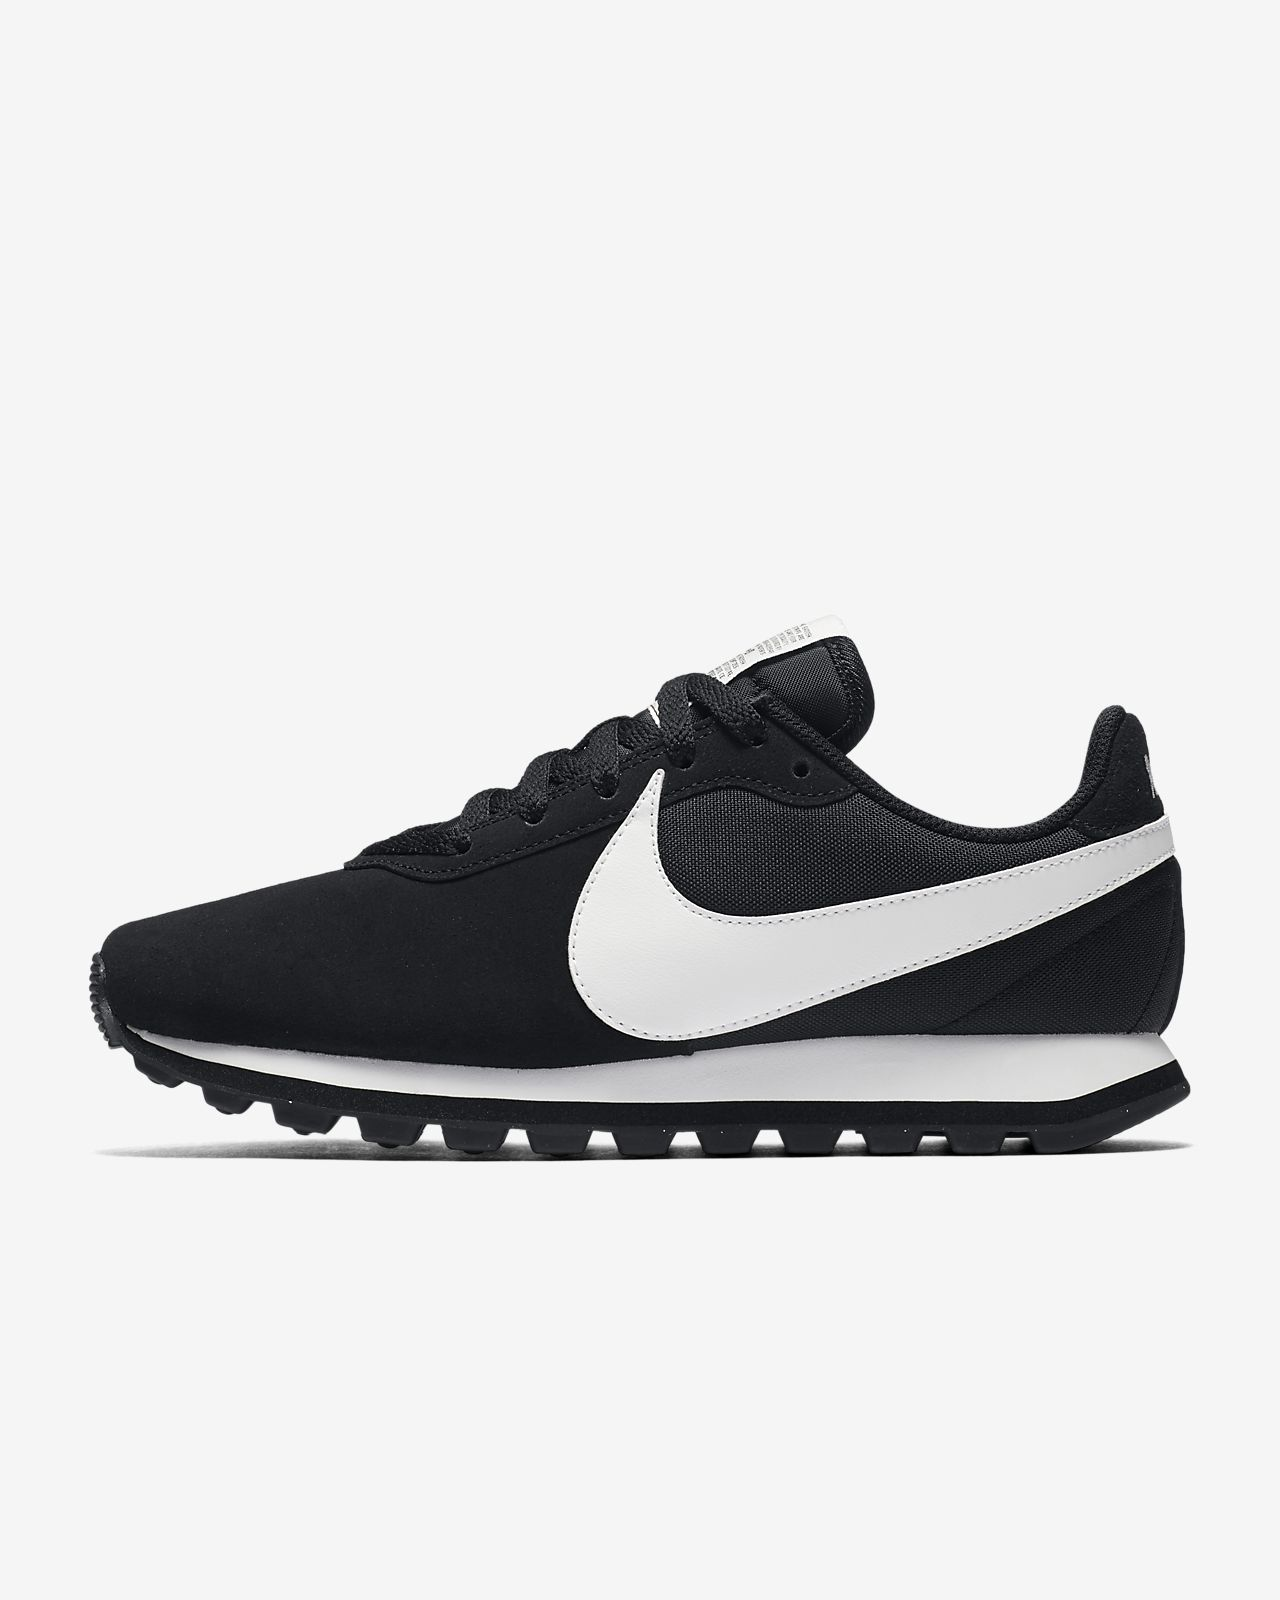 7355c7a2a1848 Nike Pre-Love O.X. Women's Shoe. Nike.com ZA